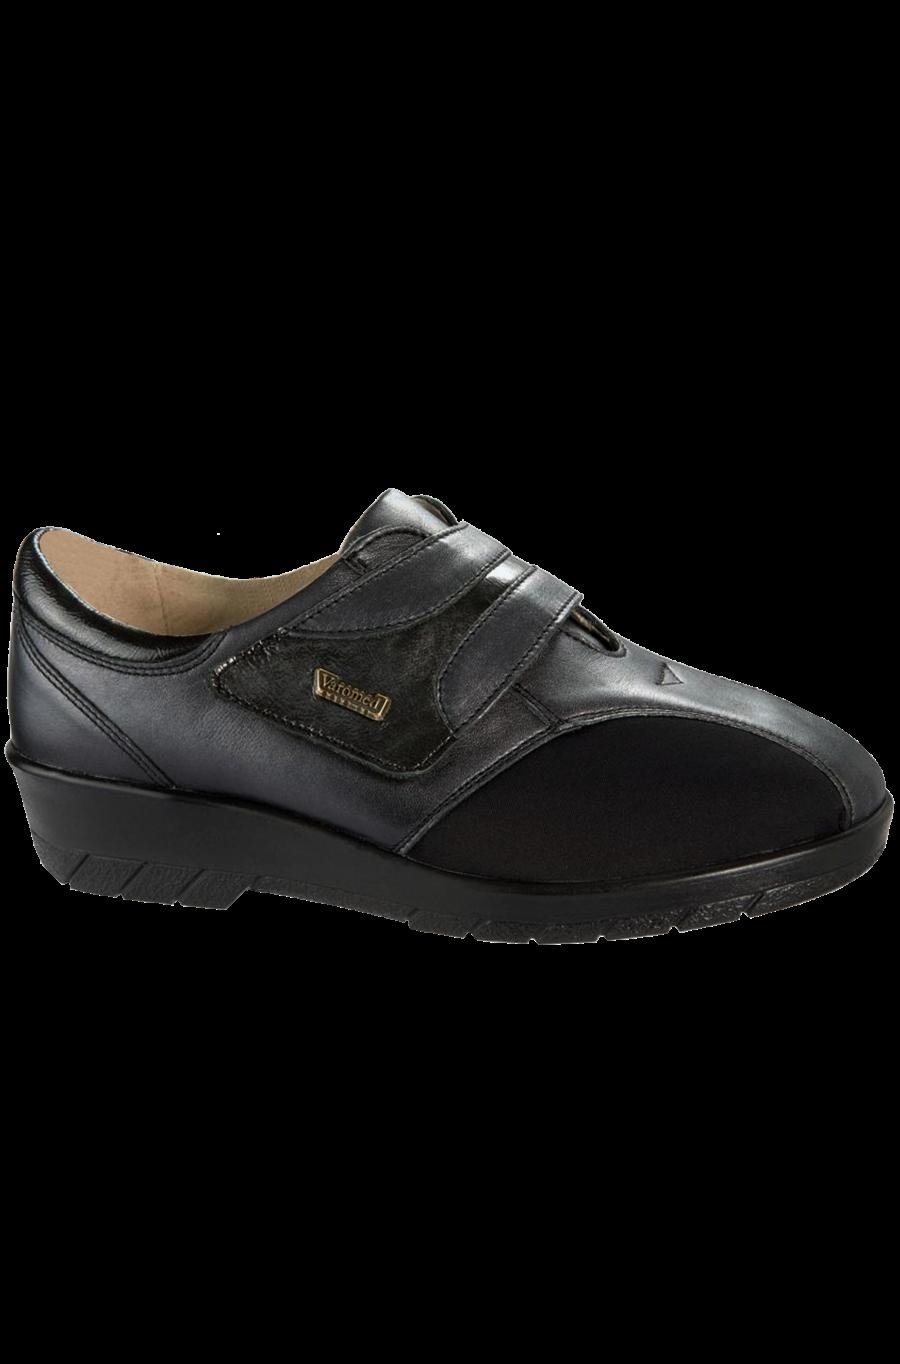 21cd56676a7b0 Dámska zdravotná obuv Varomed Minsk